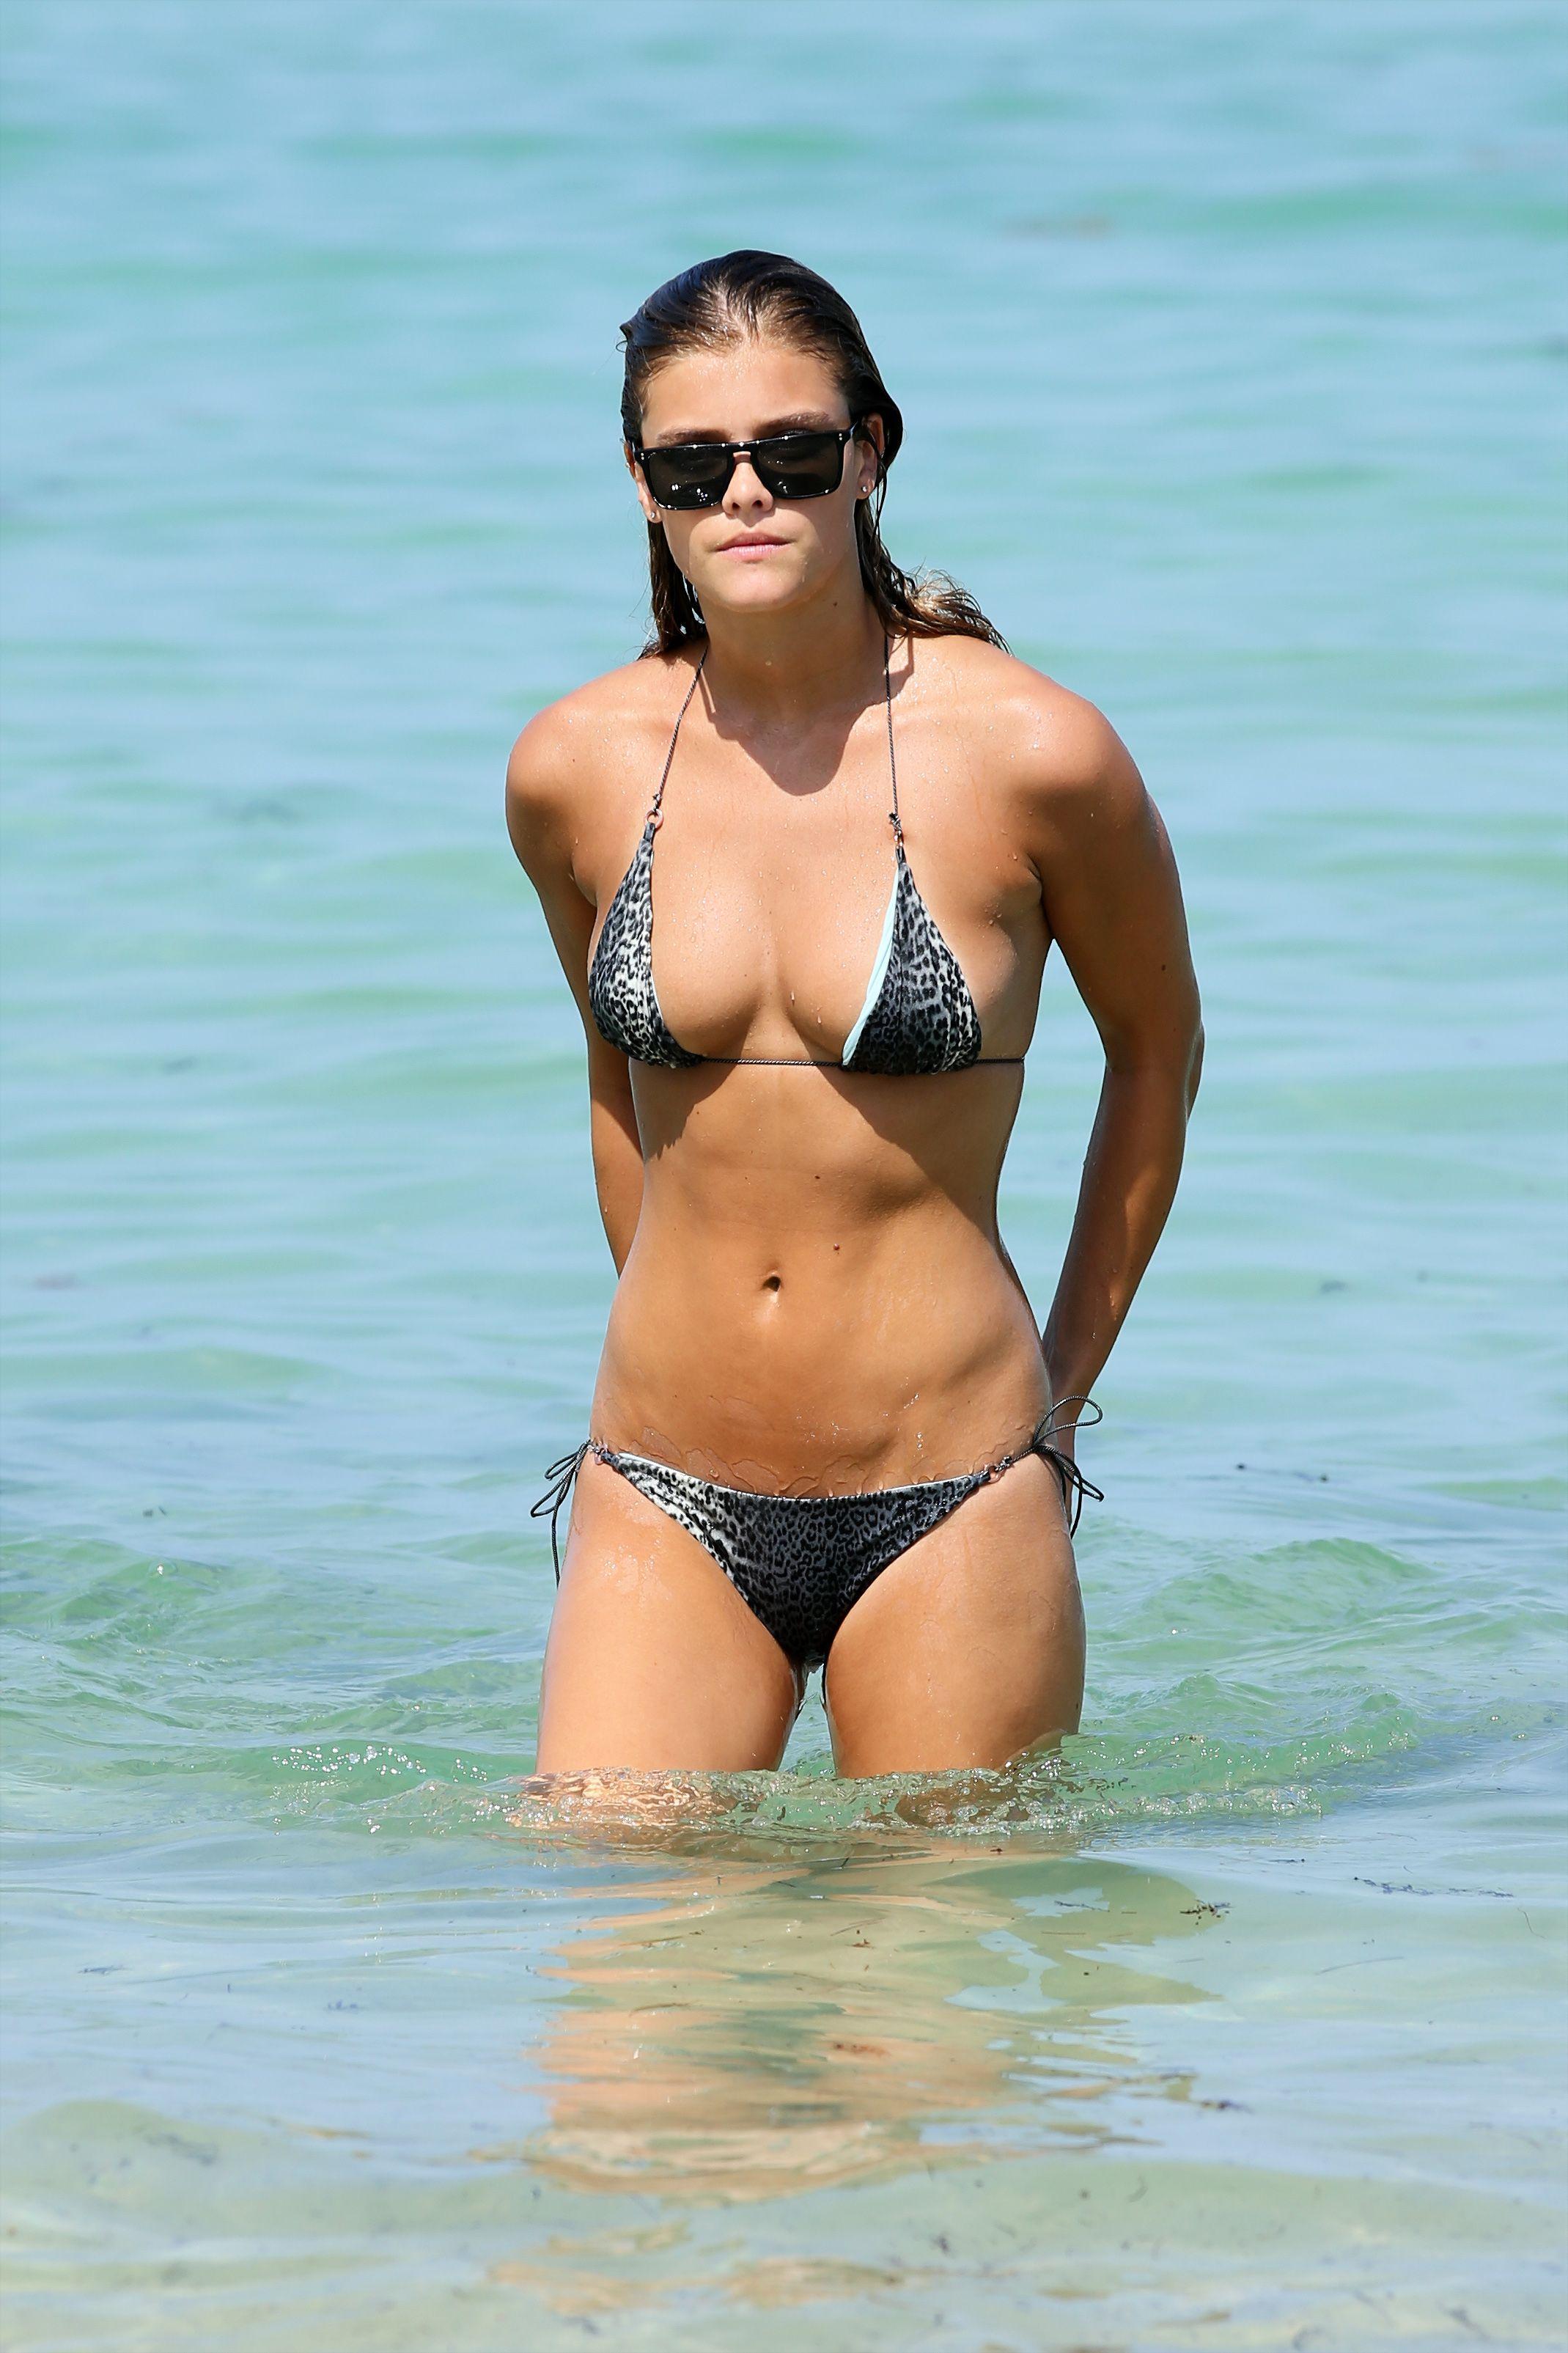 000d8b0b8b769 Celebrity Bikini Bodies, Beach Sessions, Bikini Photos, Bikini Pictures,  Bikini Swimwear,